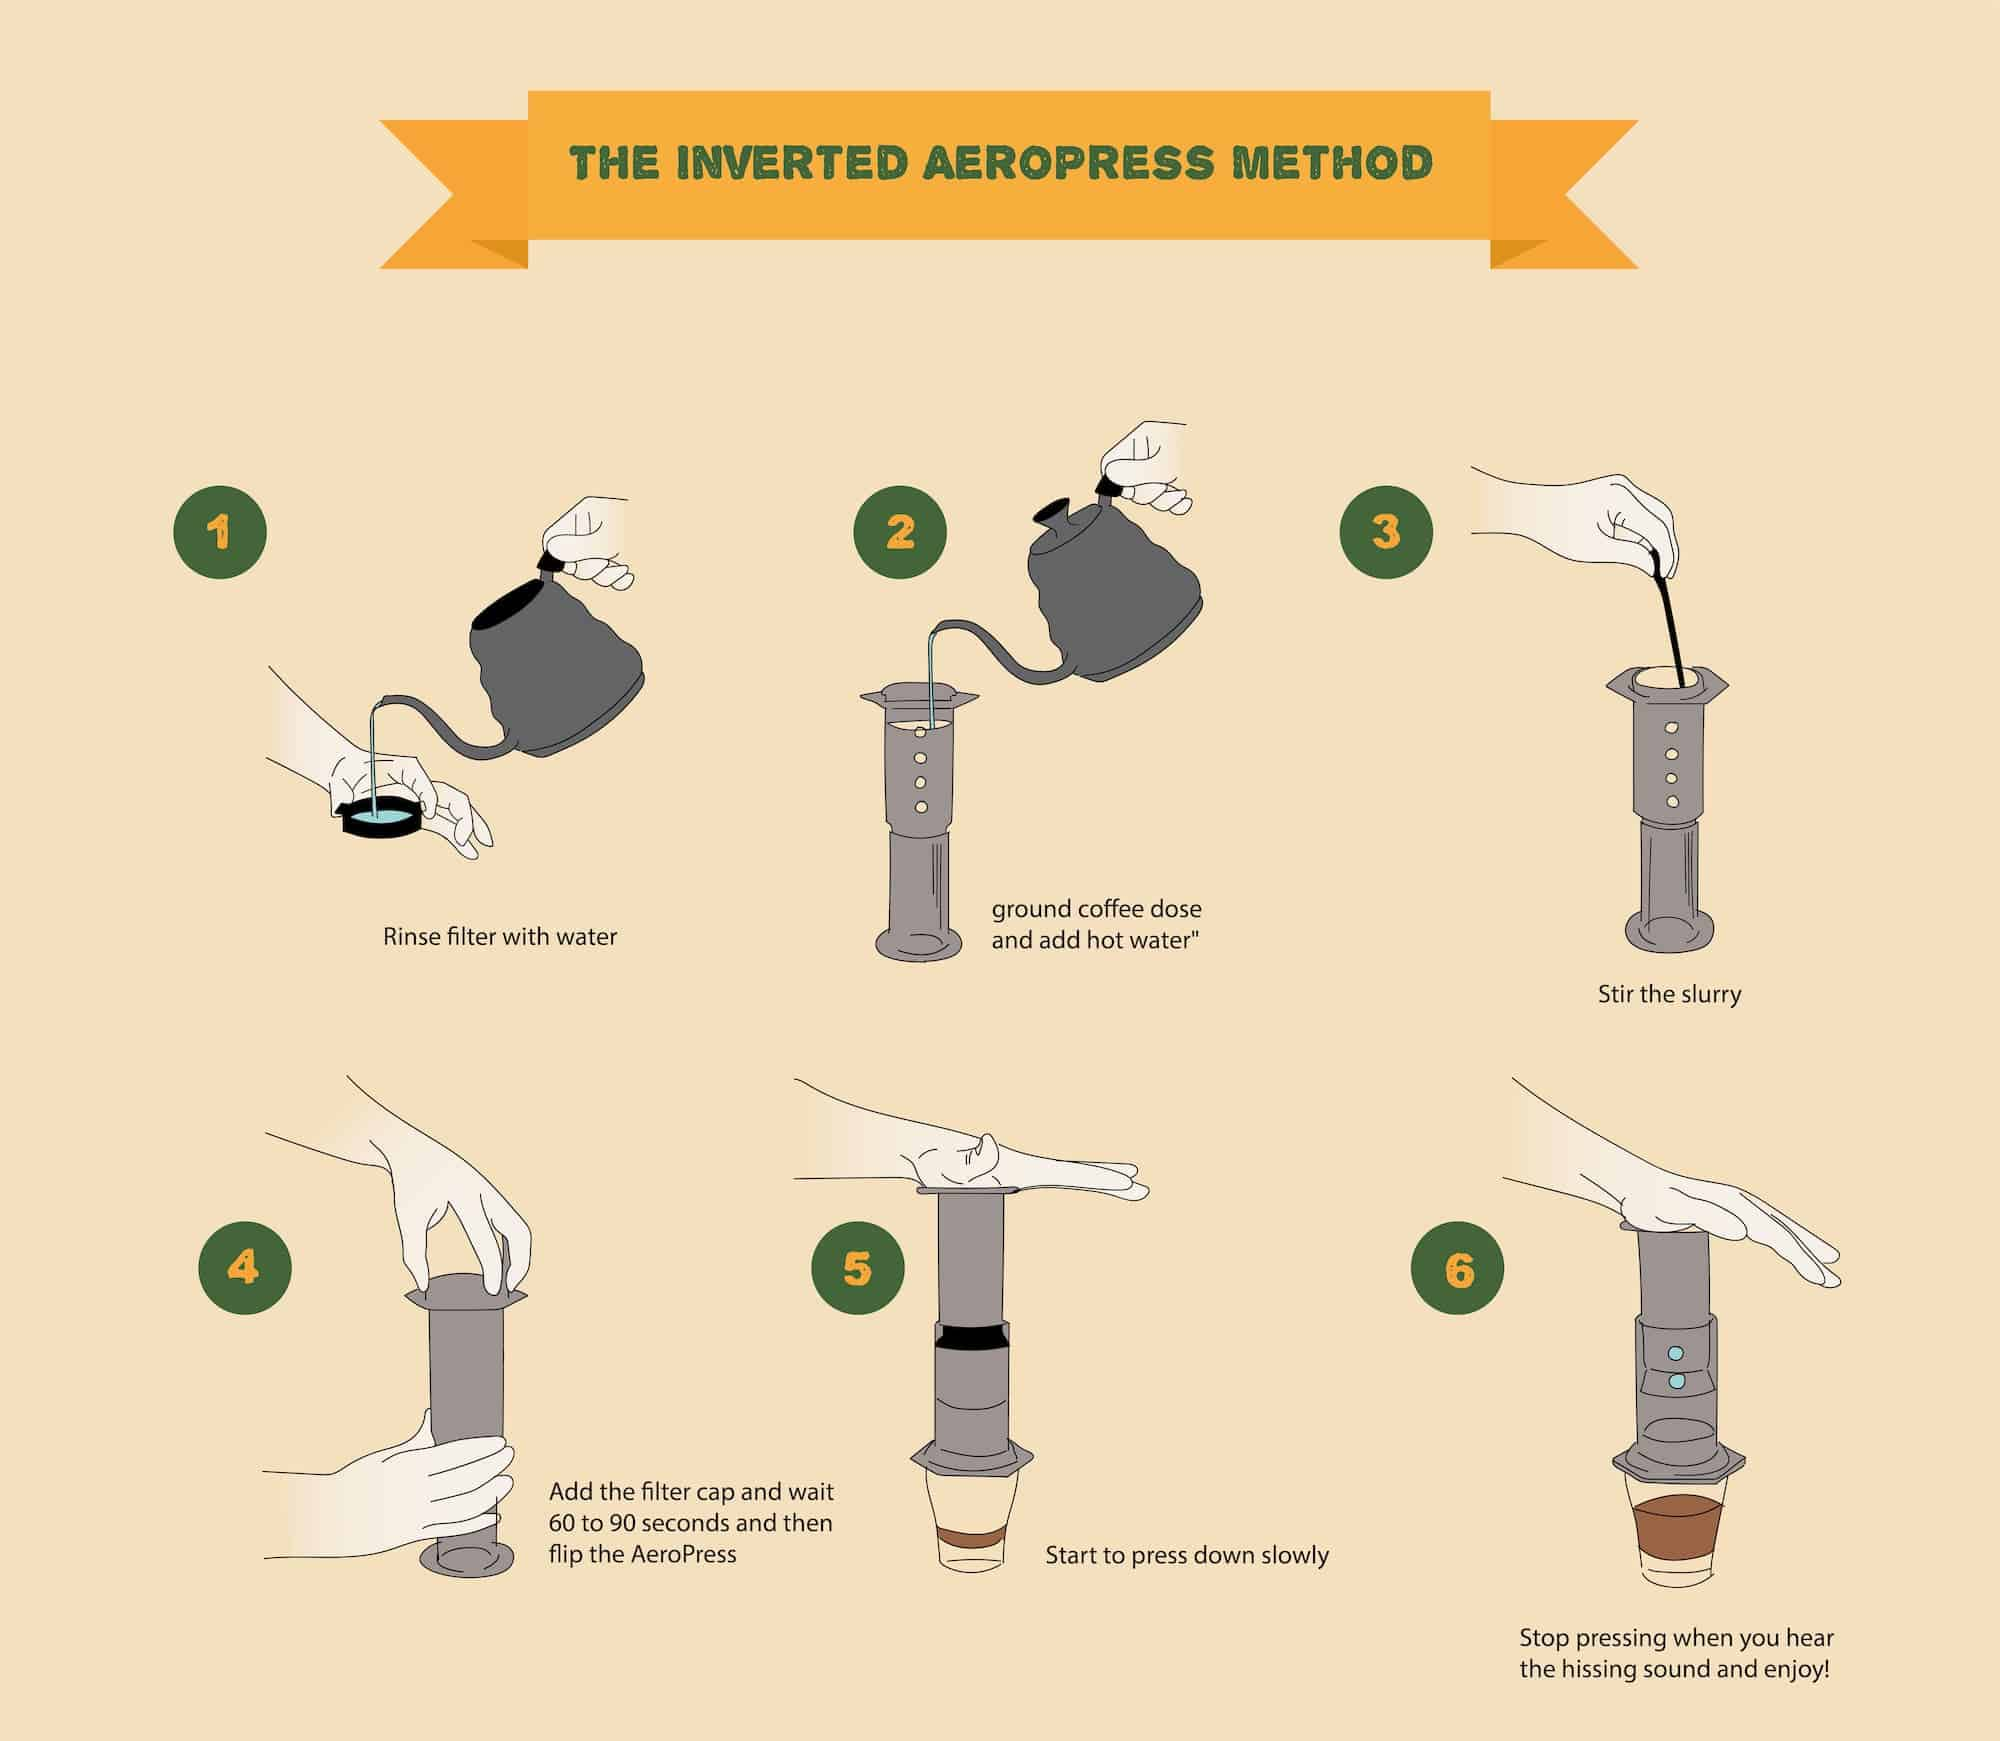 inverted aeropress method infographic